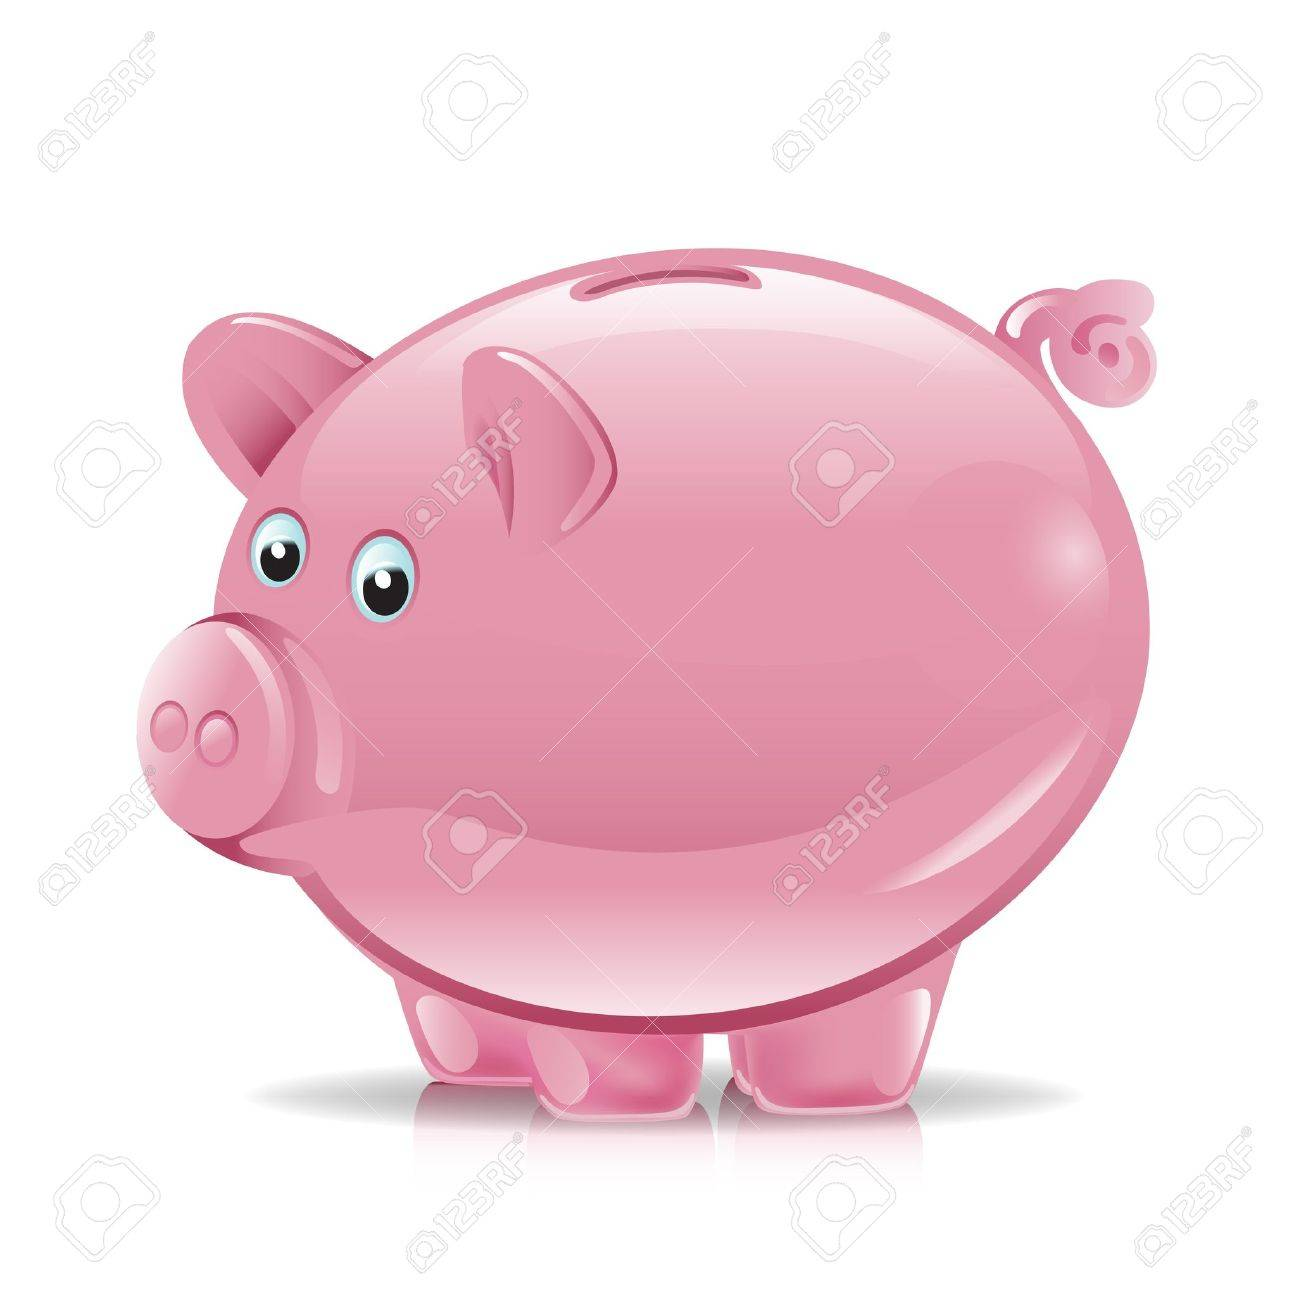 single pink piggy bank illustration Stock Vector - 11137375